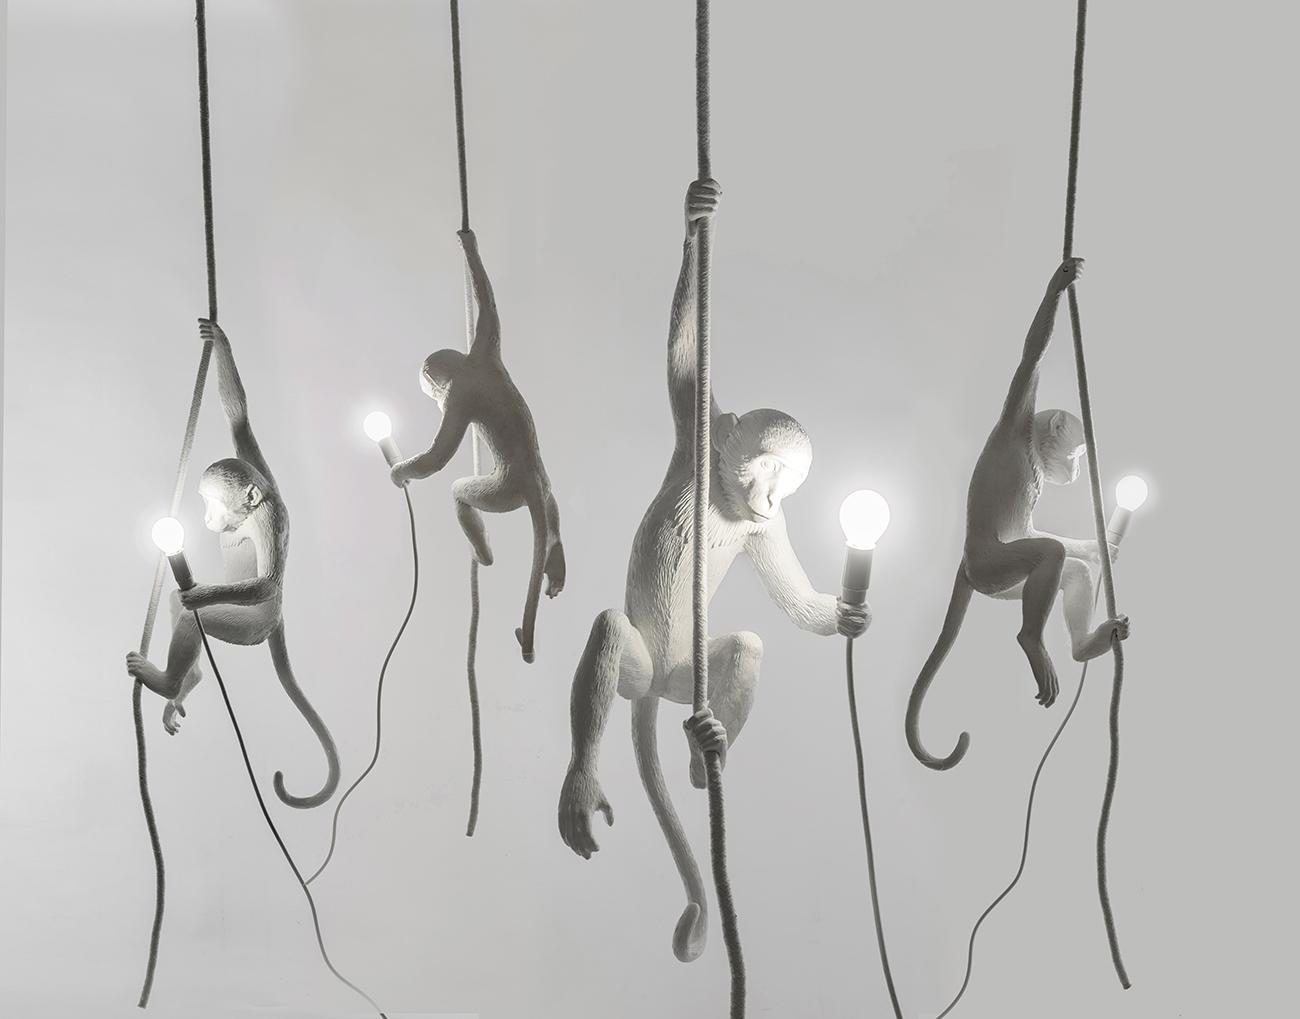 Marcantonio art design - Monkey Lamp Group ON.jpg